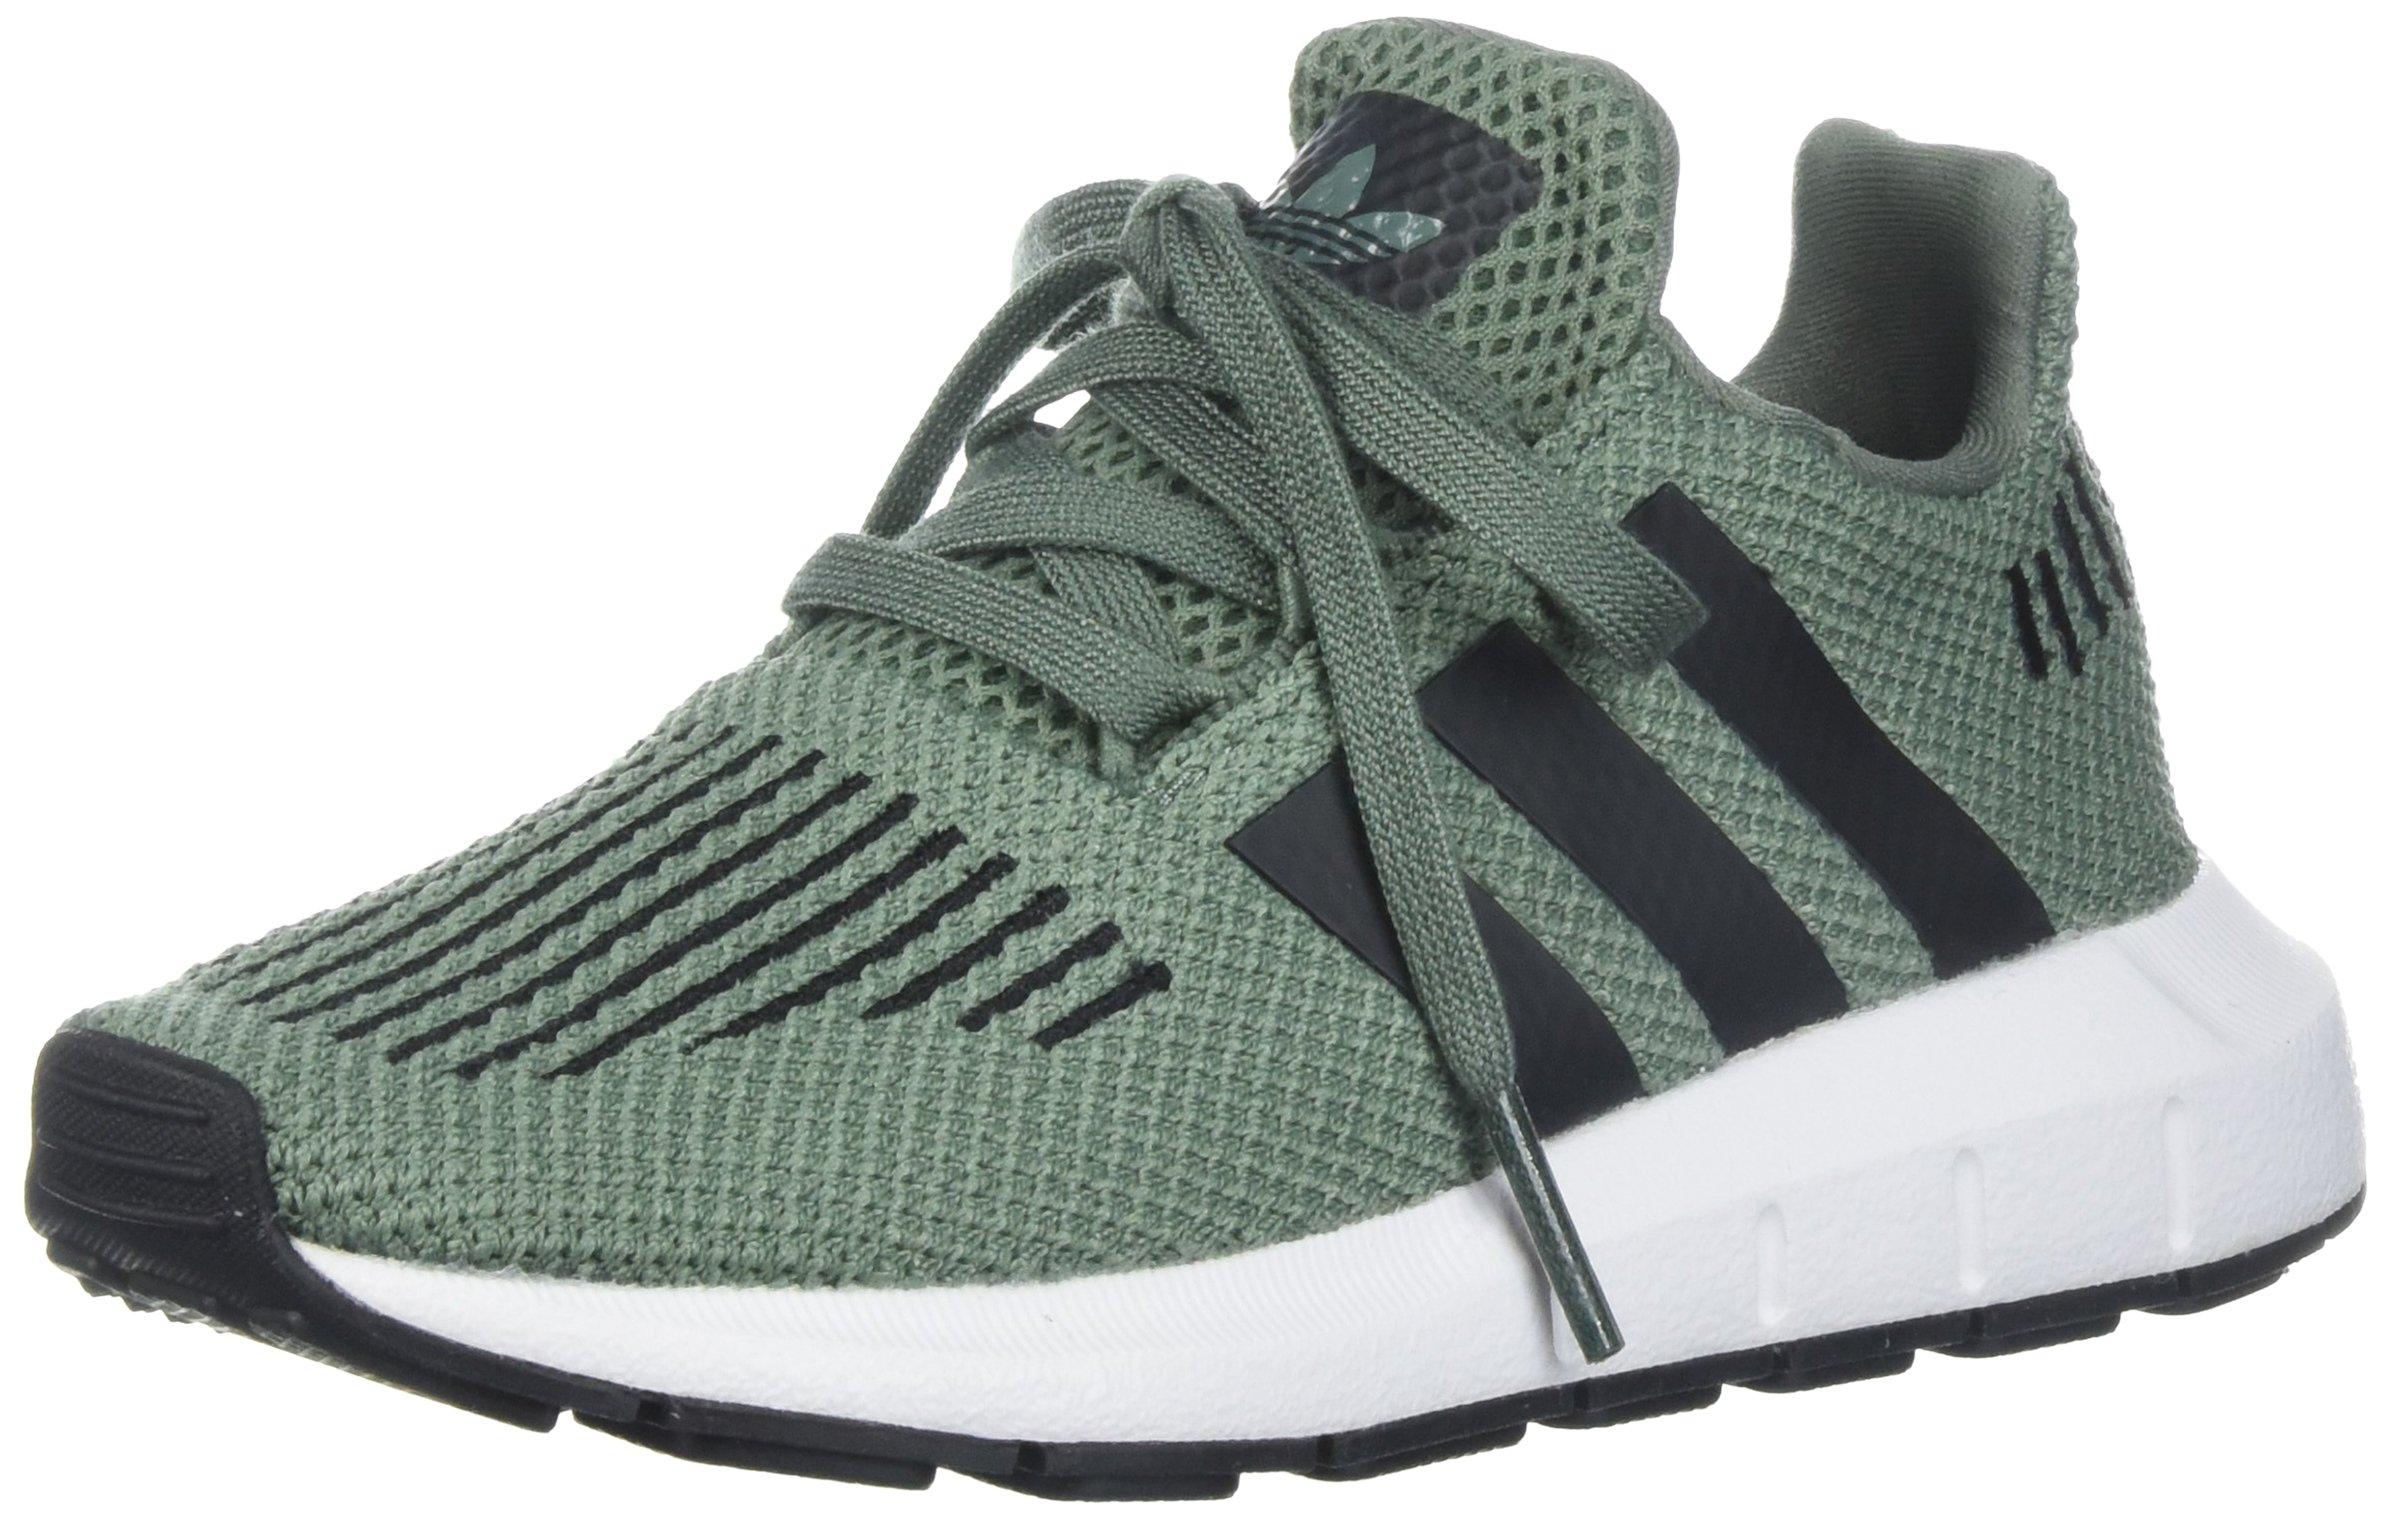 adidas Boys' Swift Run C Sneaker, Trace Green/Black/White, 12 M US Little Kid